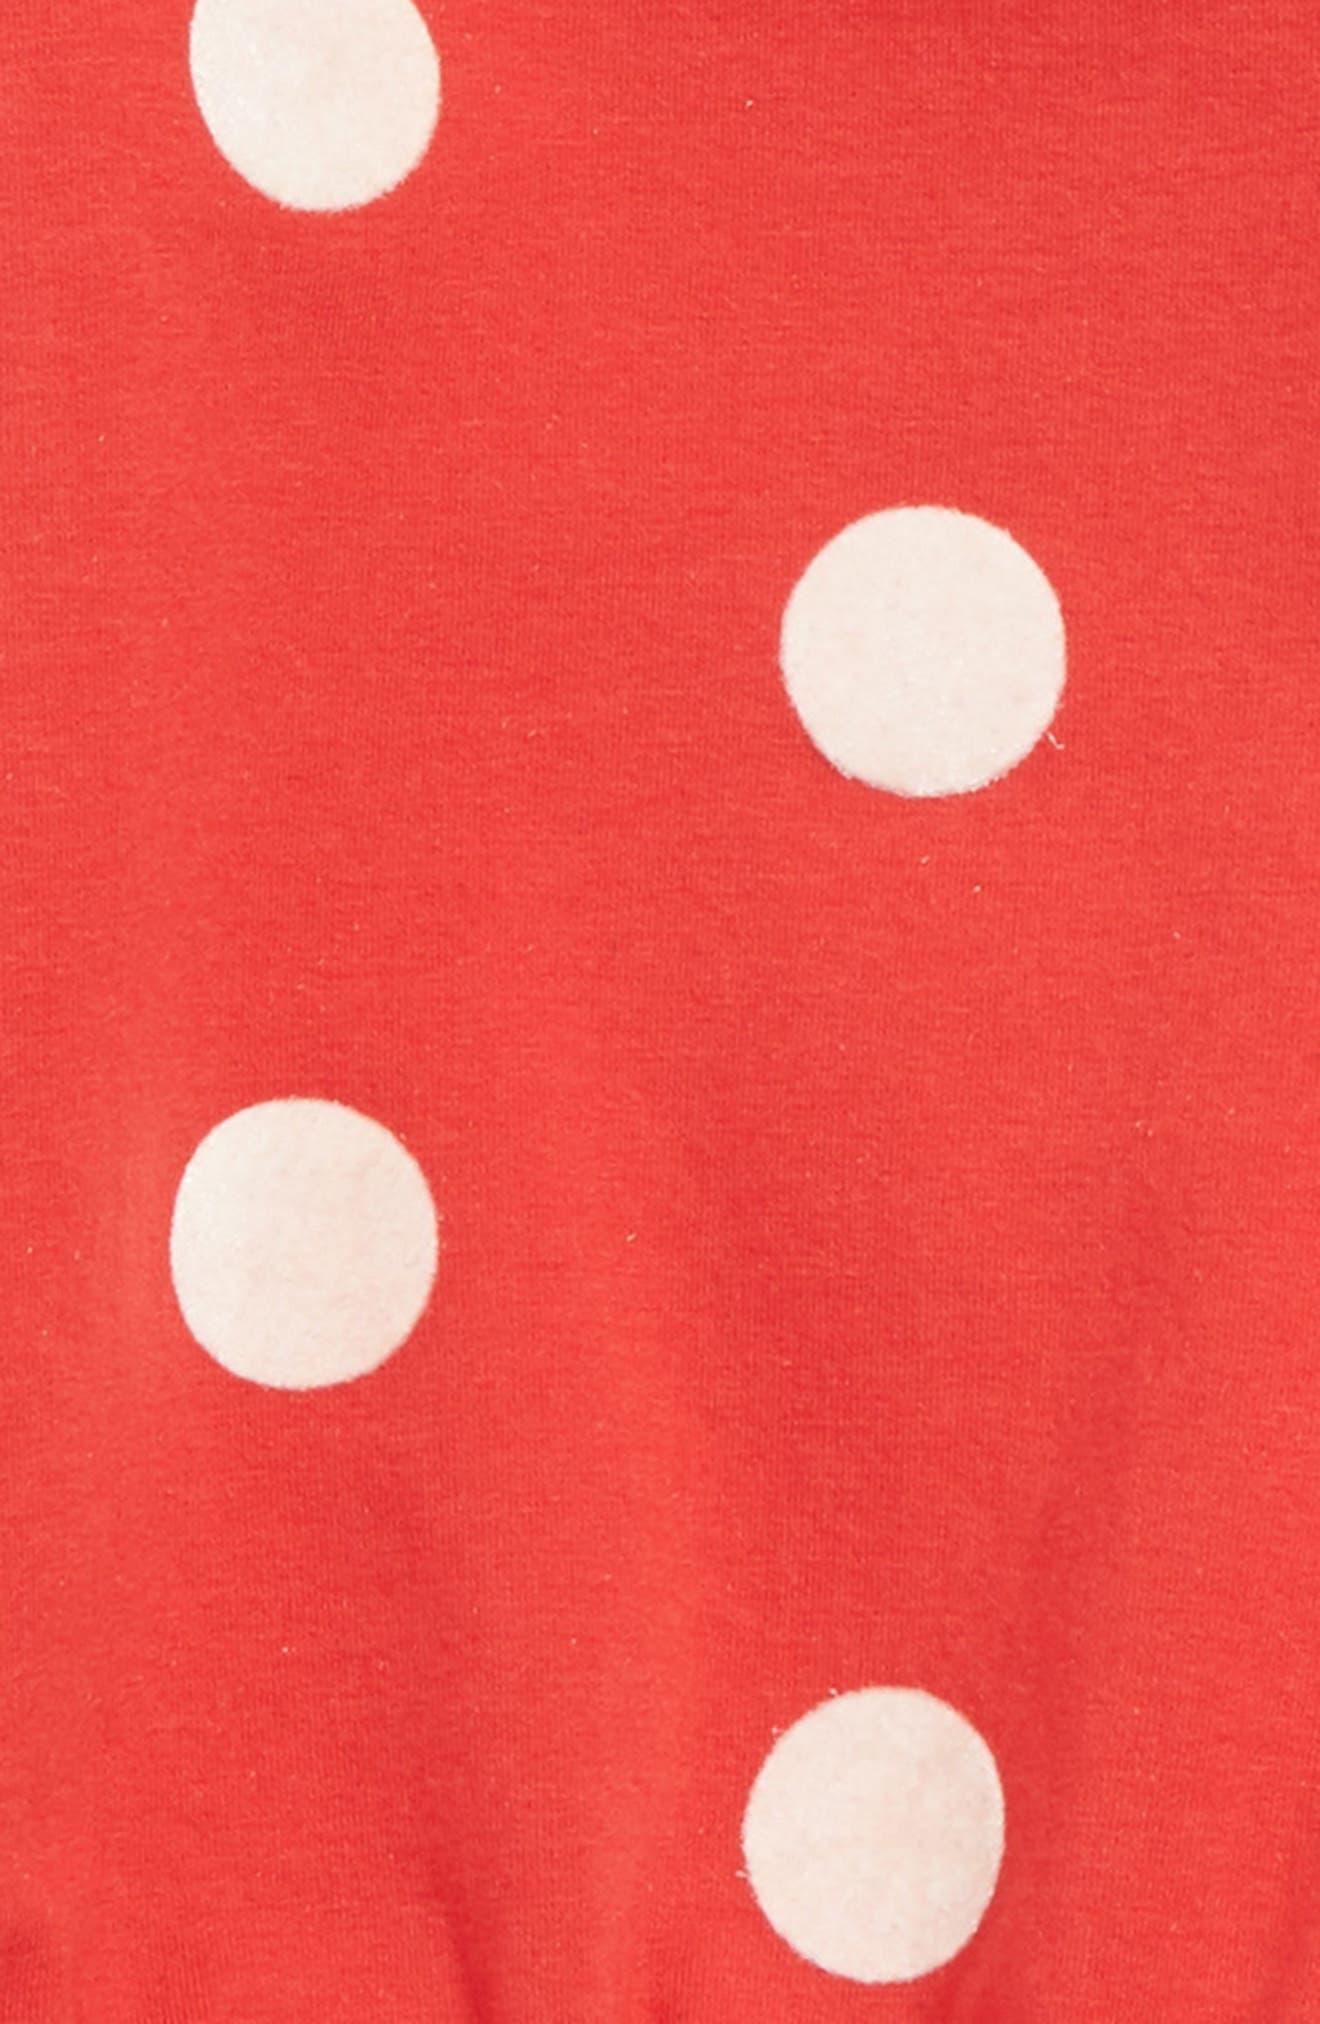 Cozy Polka Dot Tunic & Leggings Set,                             Alternate thumbnail 2, color,                             610